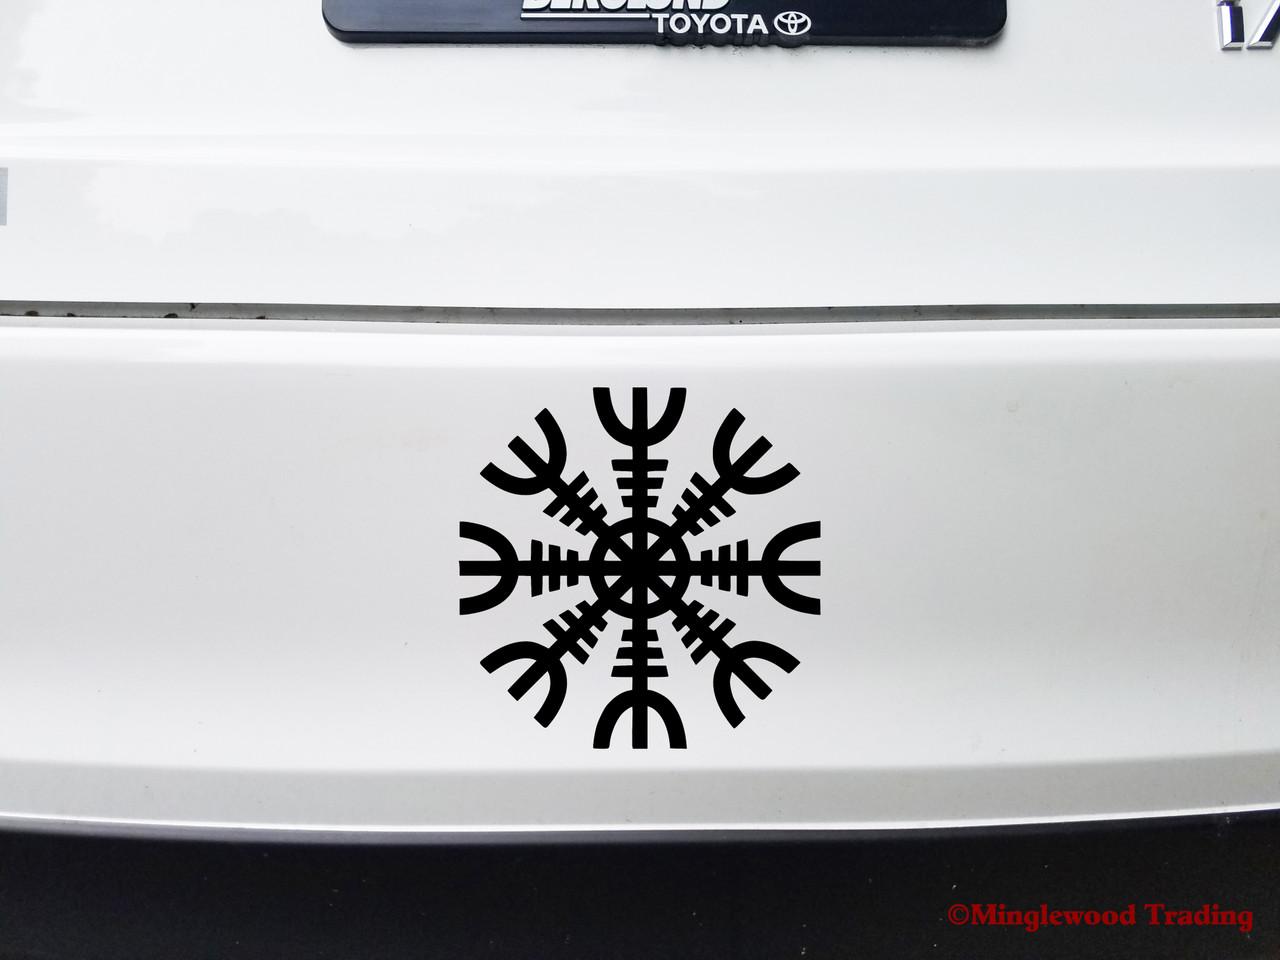 HELM OF AWE Vinyl Sticker - Norse Mythology - Helm of Terror Viking Symbol - Die Cut Decal